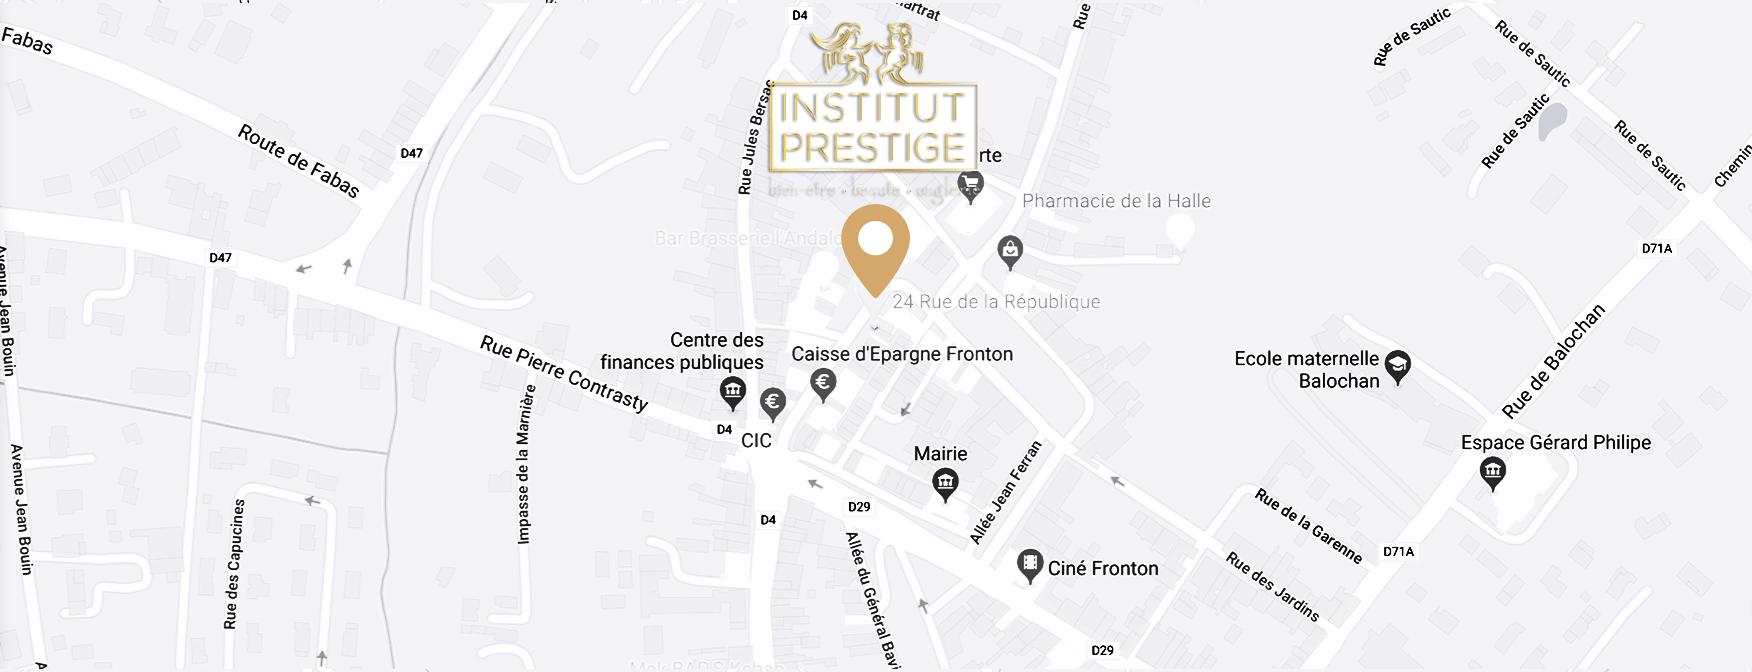 Adresse Institut Prestige, Institut Beaute FRONTON, BOULOC, CASTELNAU D'ESTRETEFOND, VILLAUDRIC, VILLEMUR-SUR-TARN, LABASTIDE ST-PIERRE, FABAS, ORGUEIL et CAMPSAS